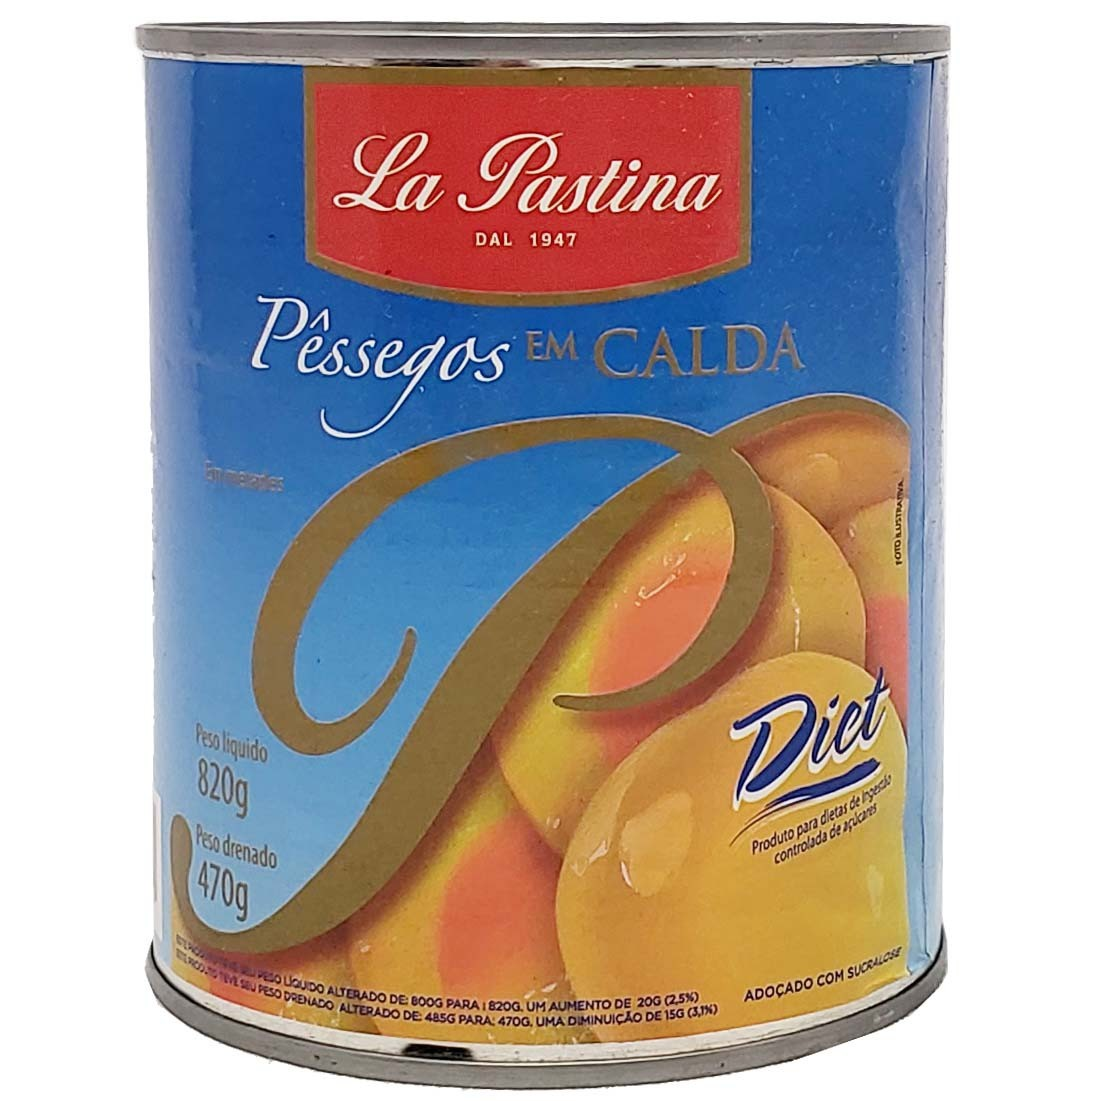 Pêssegos Em Calda Diet La Pastina - 470g -